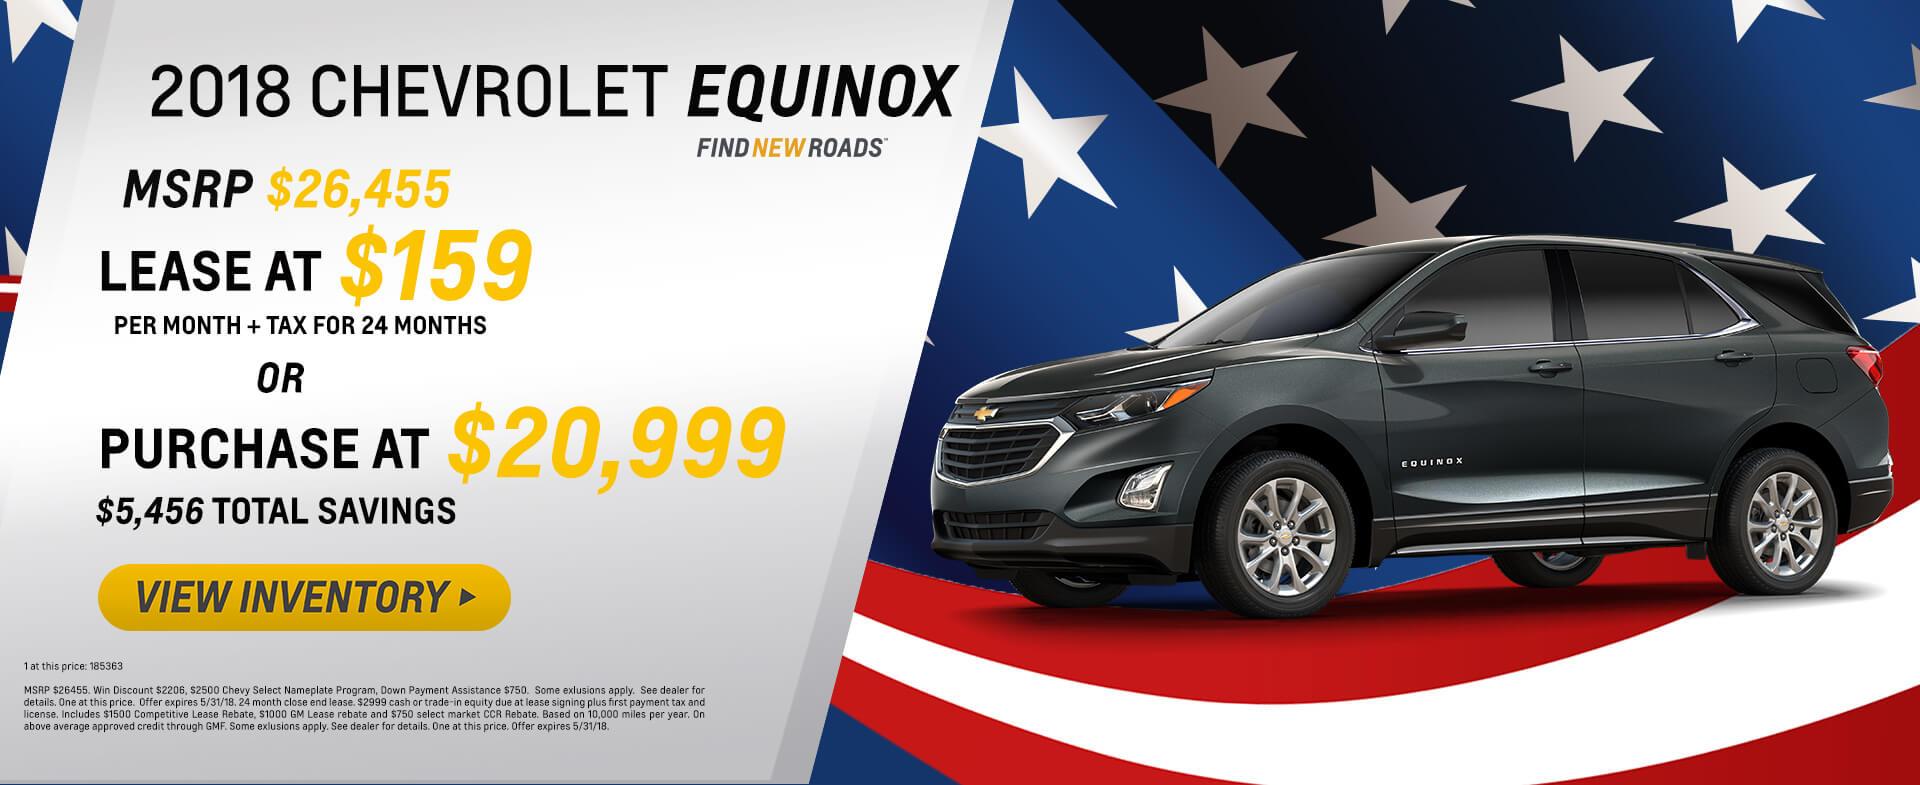 2018 Equinox $5000 off